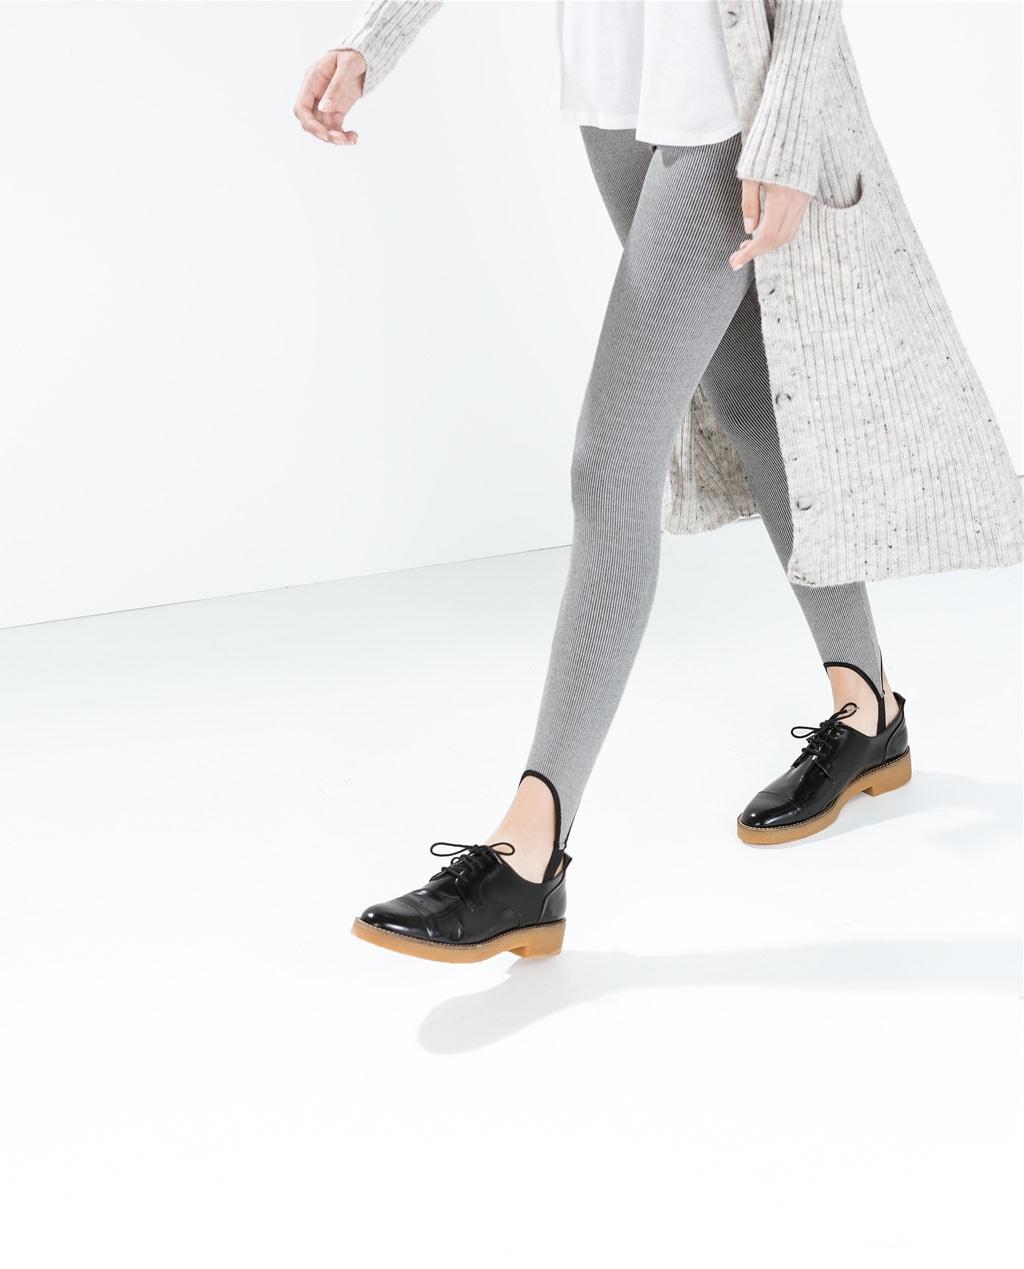 leggings fouseaux zara trend inverno 2014